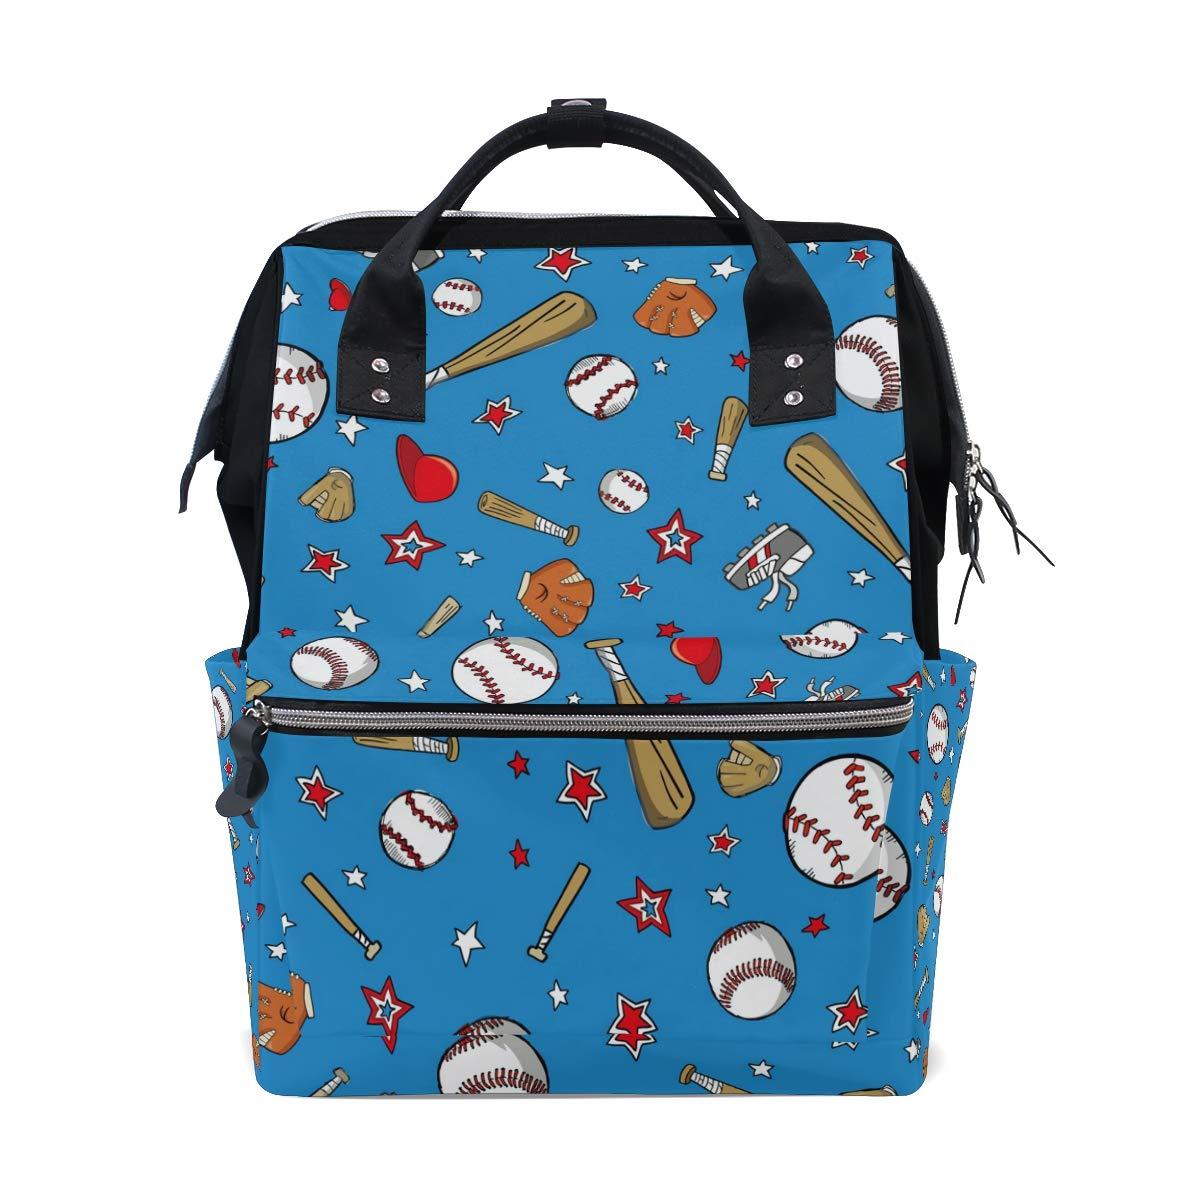 MERRYSUGAR Diaper Bag Backpack Baseball Star Blue Baby Bag School Backpack Mommy Bag Large Multifunction Travel Bag